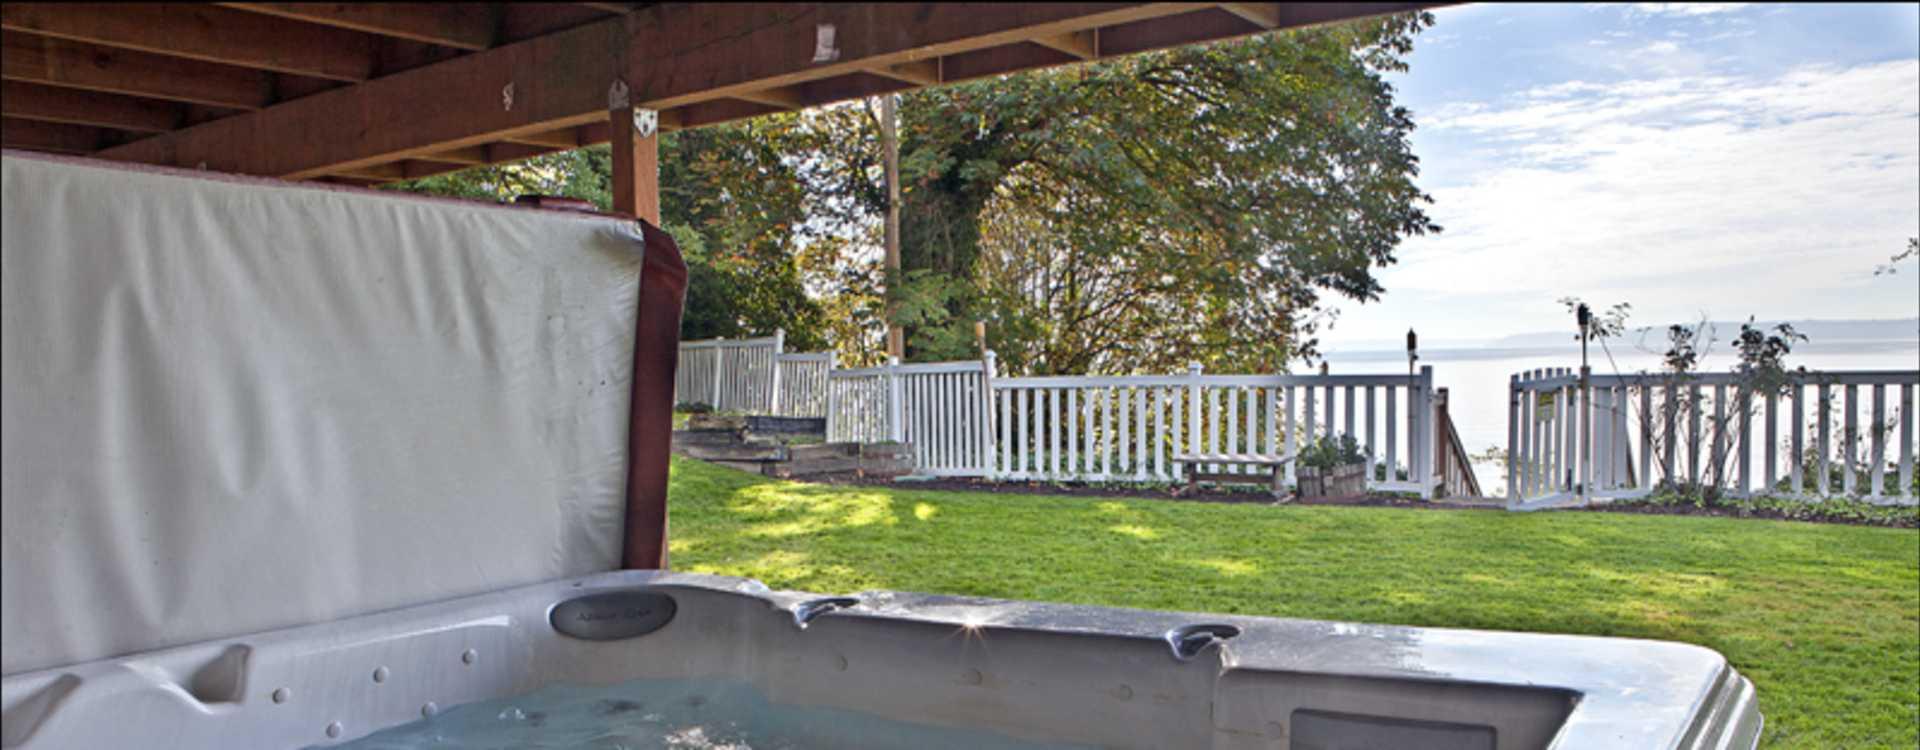 Puget_Sound_Villa_-_Vacation_Rental_Home-4.jpg